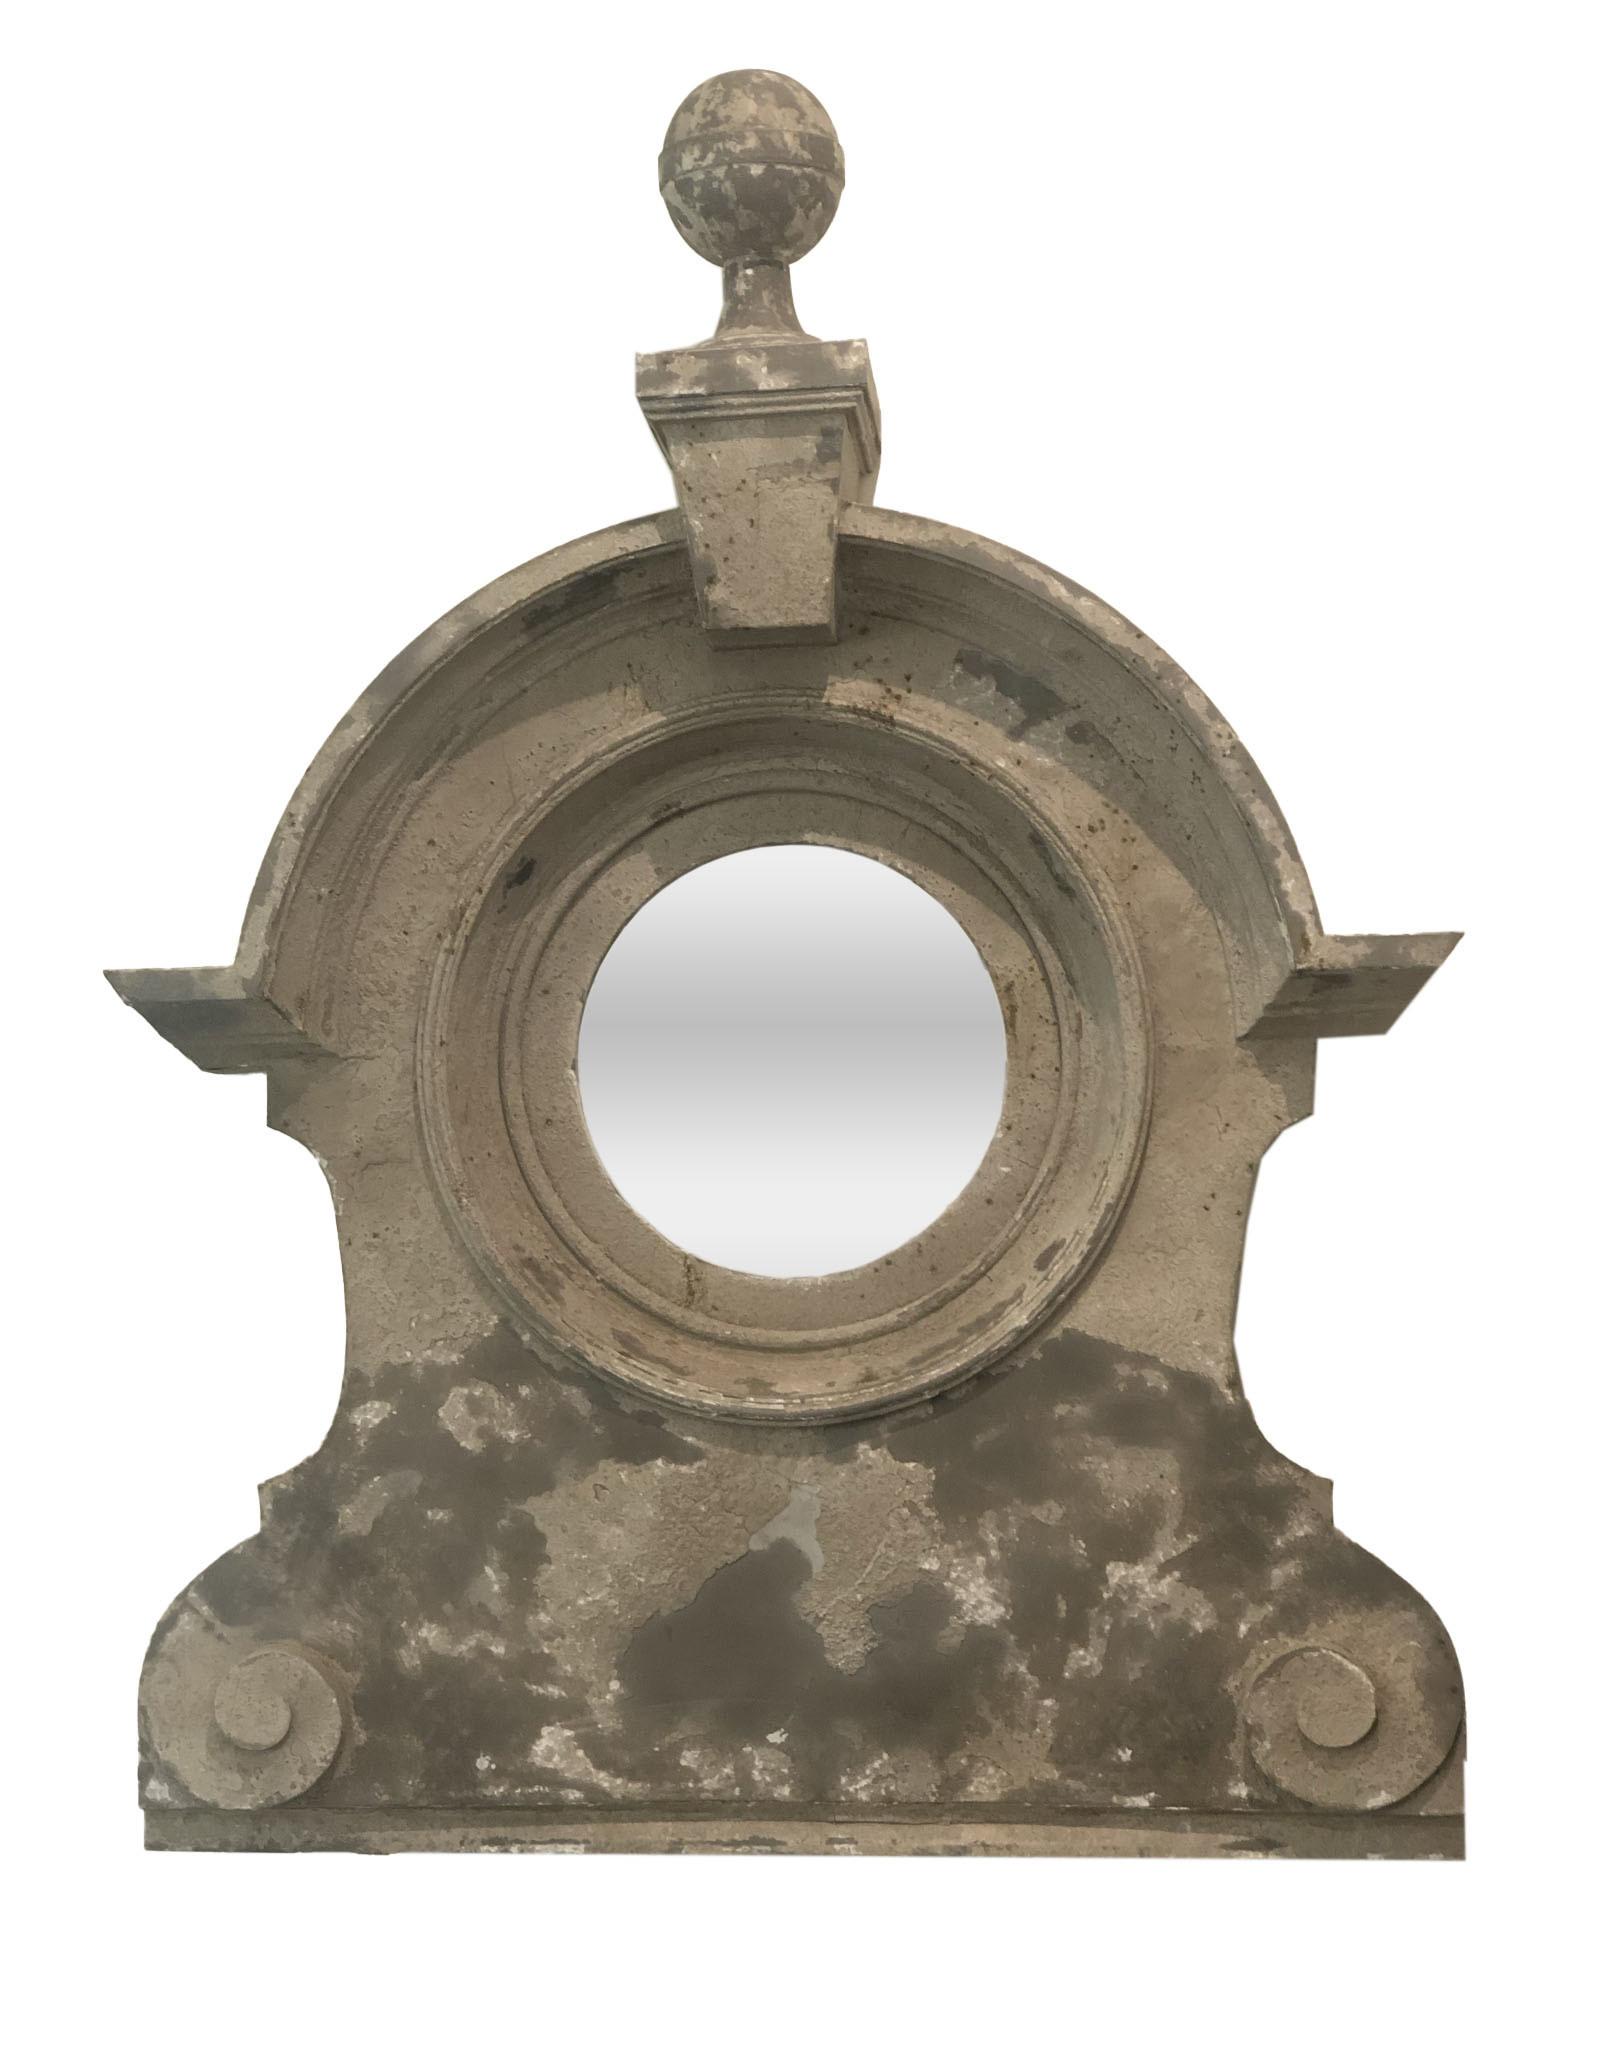 19th Century French Zinc Oeil De Boeuf Mirror